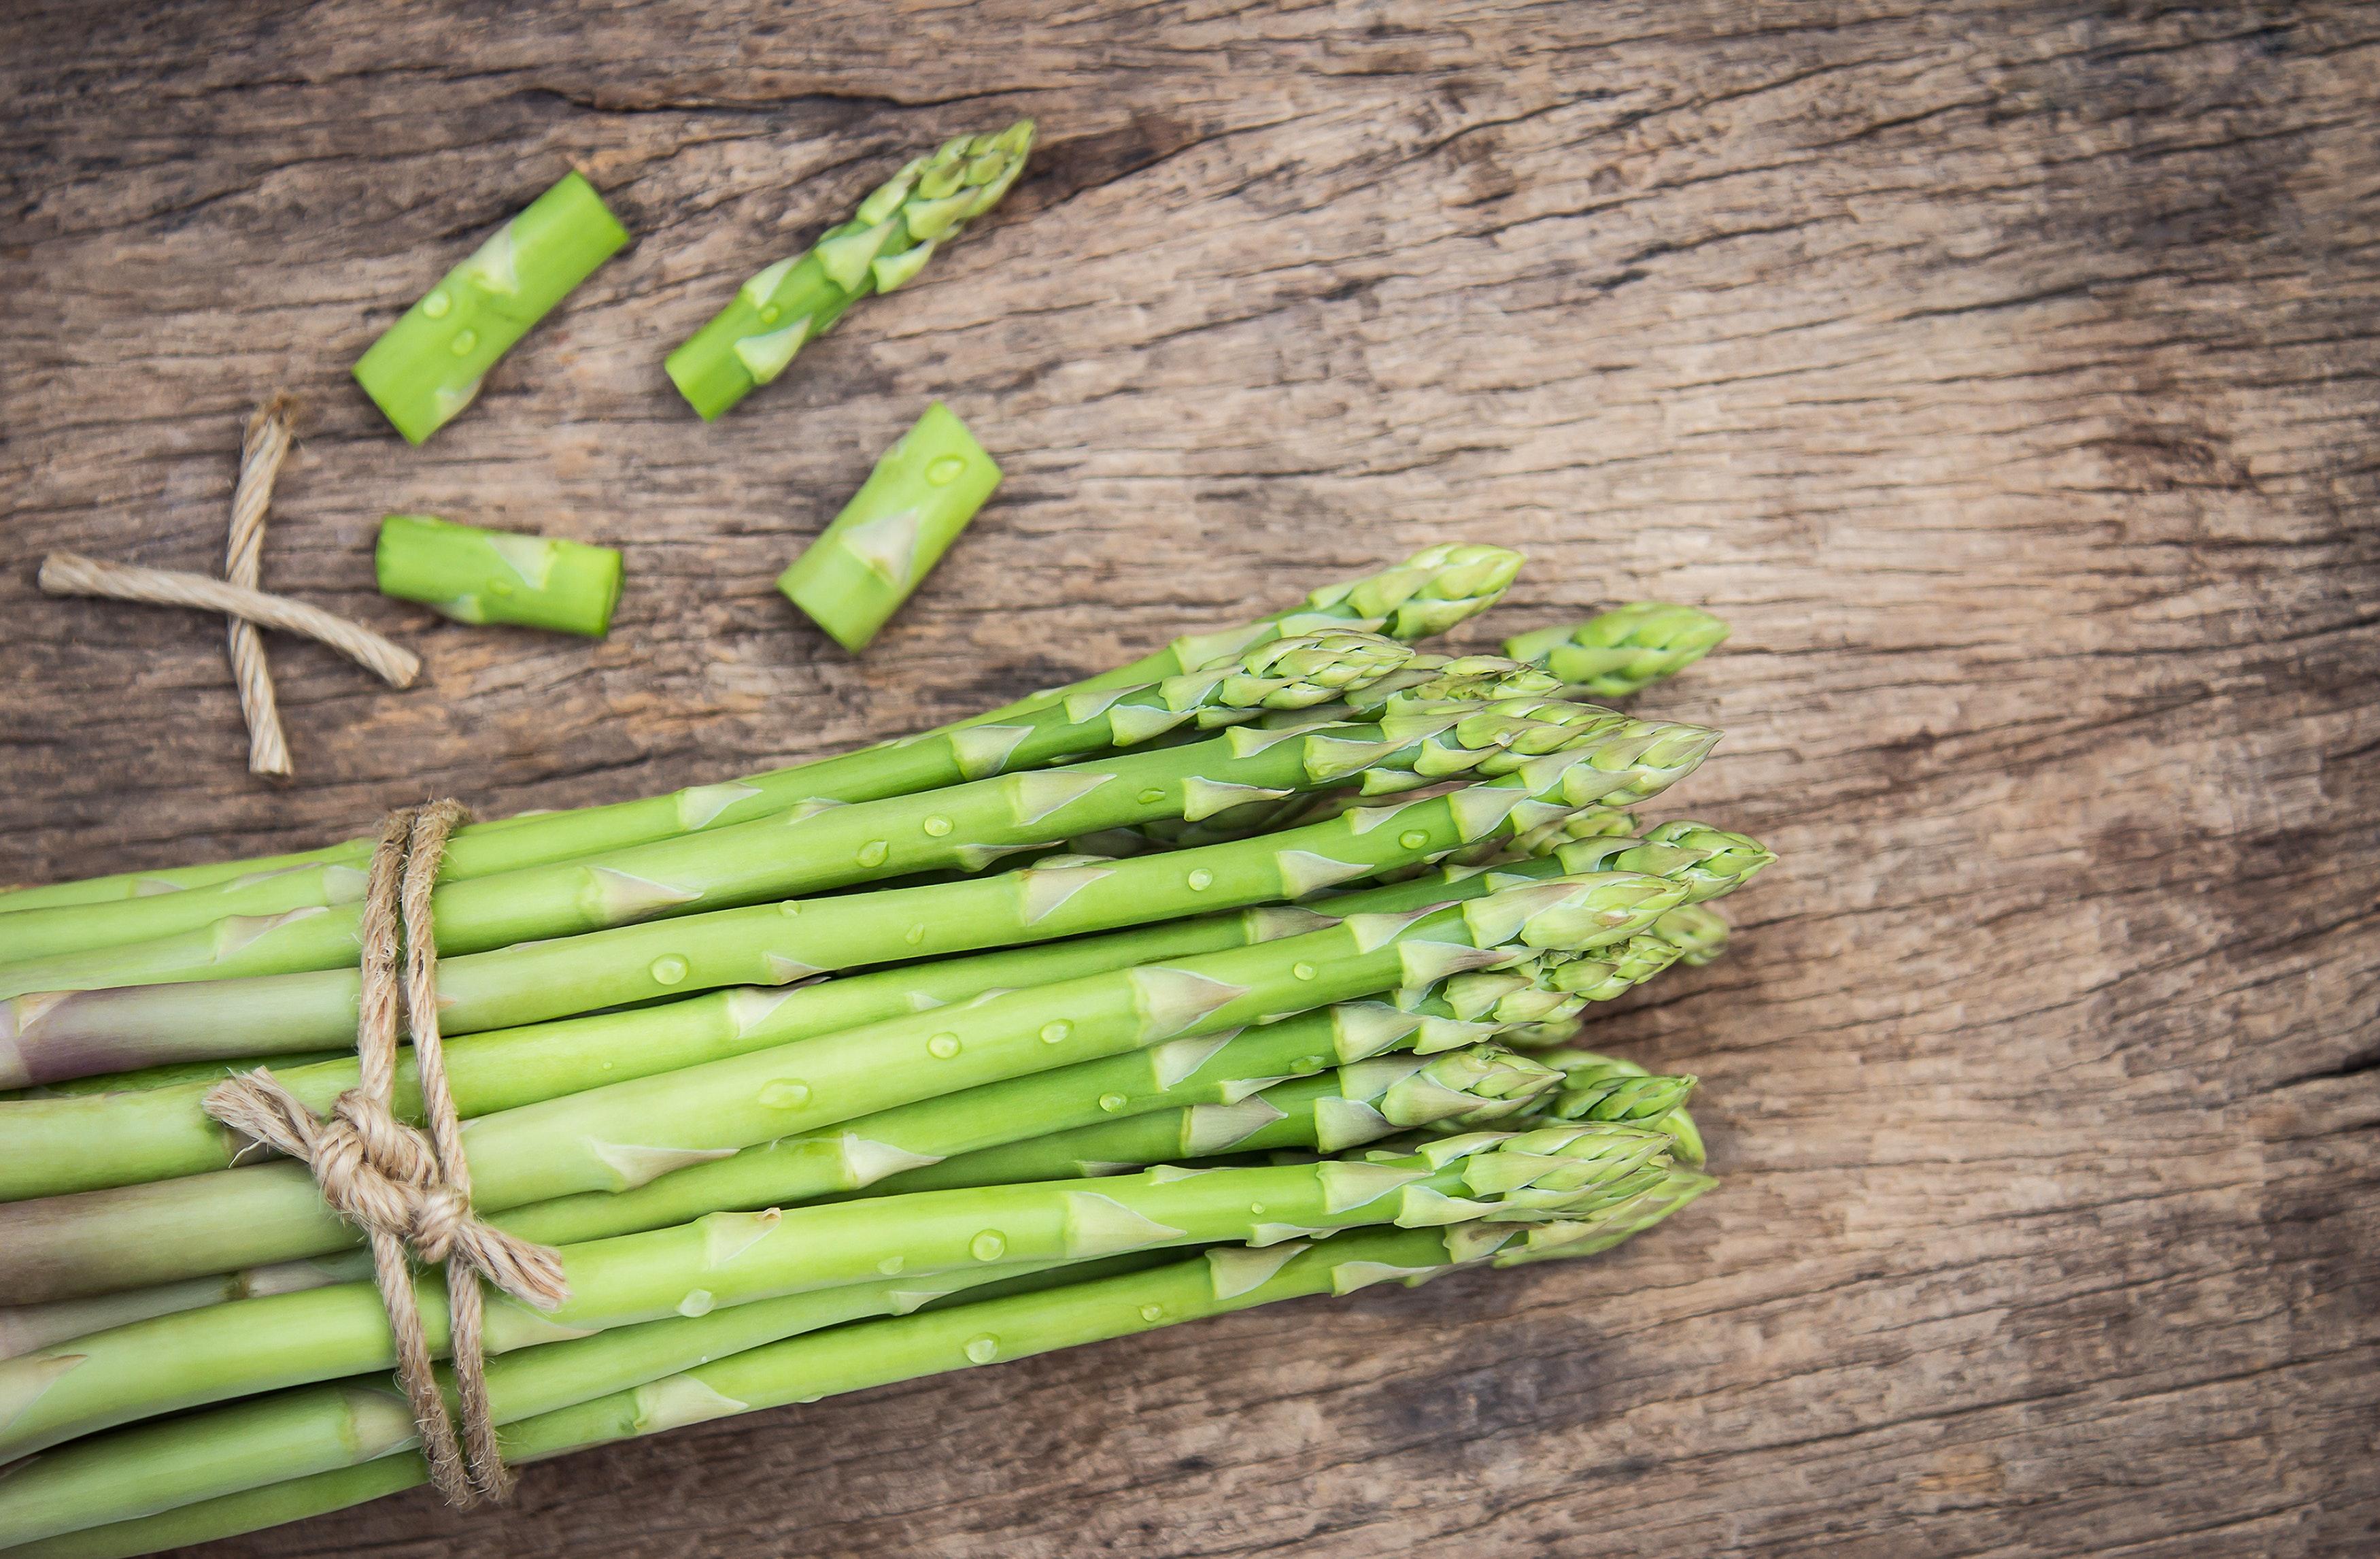 asparges sæson grøntsag (Foto: Pexels)